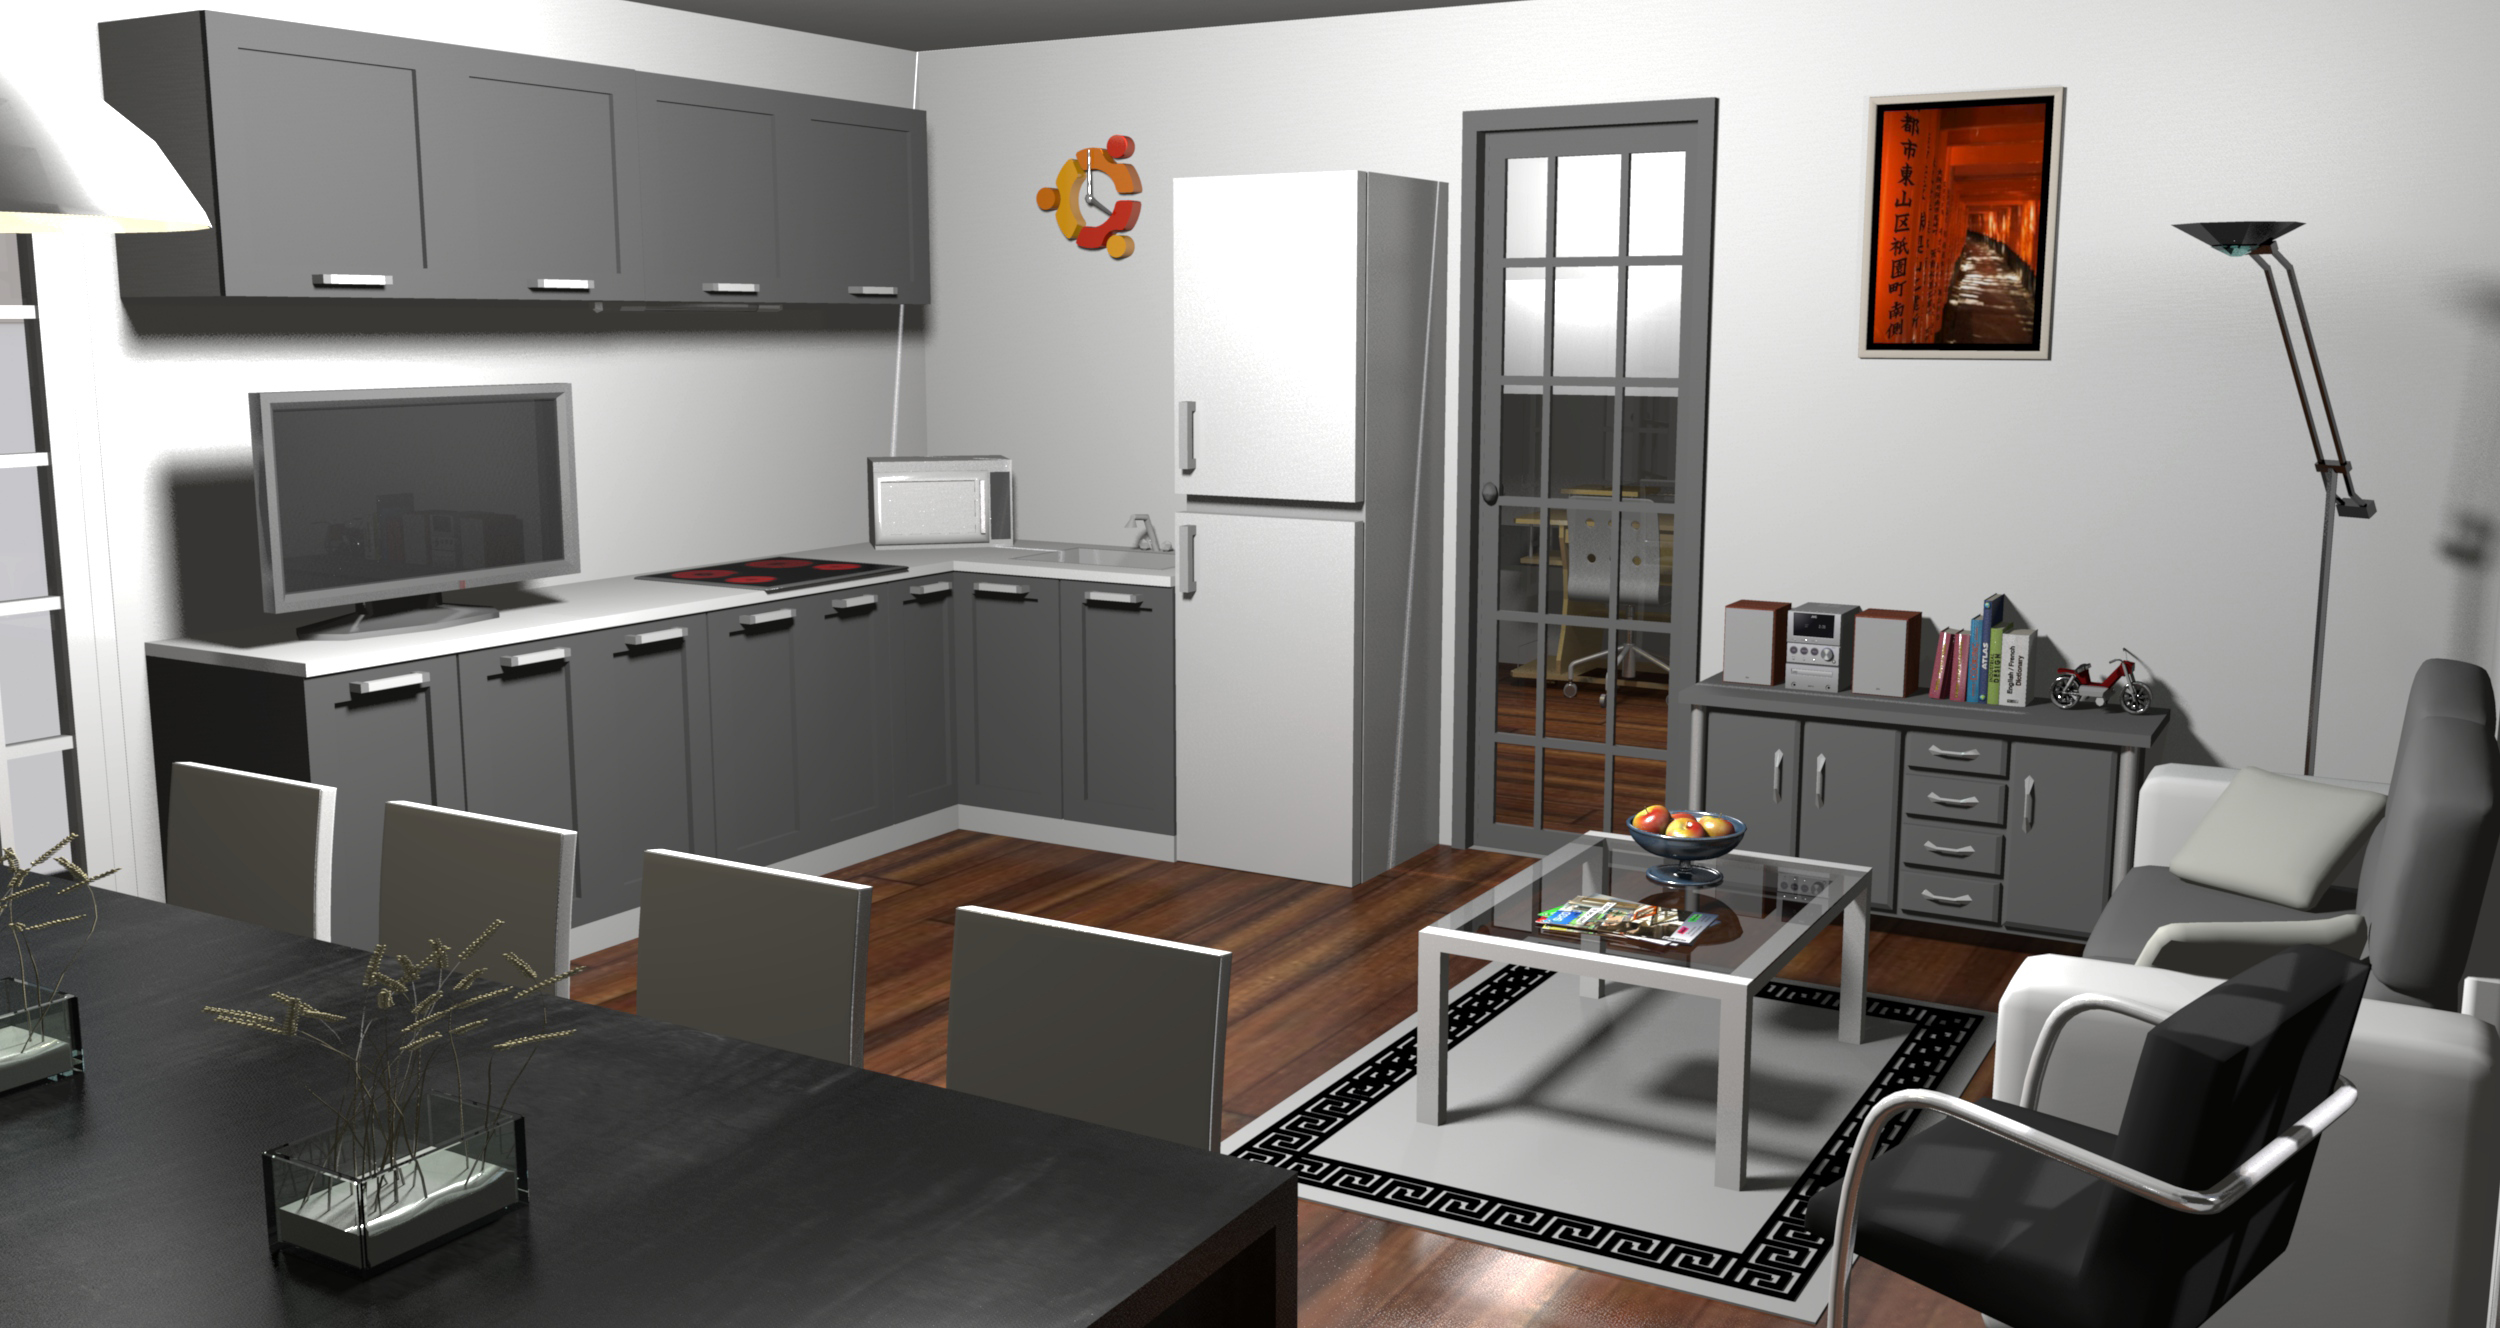 Software decoracion interiores latest software decoracion for Software decoracion interiores